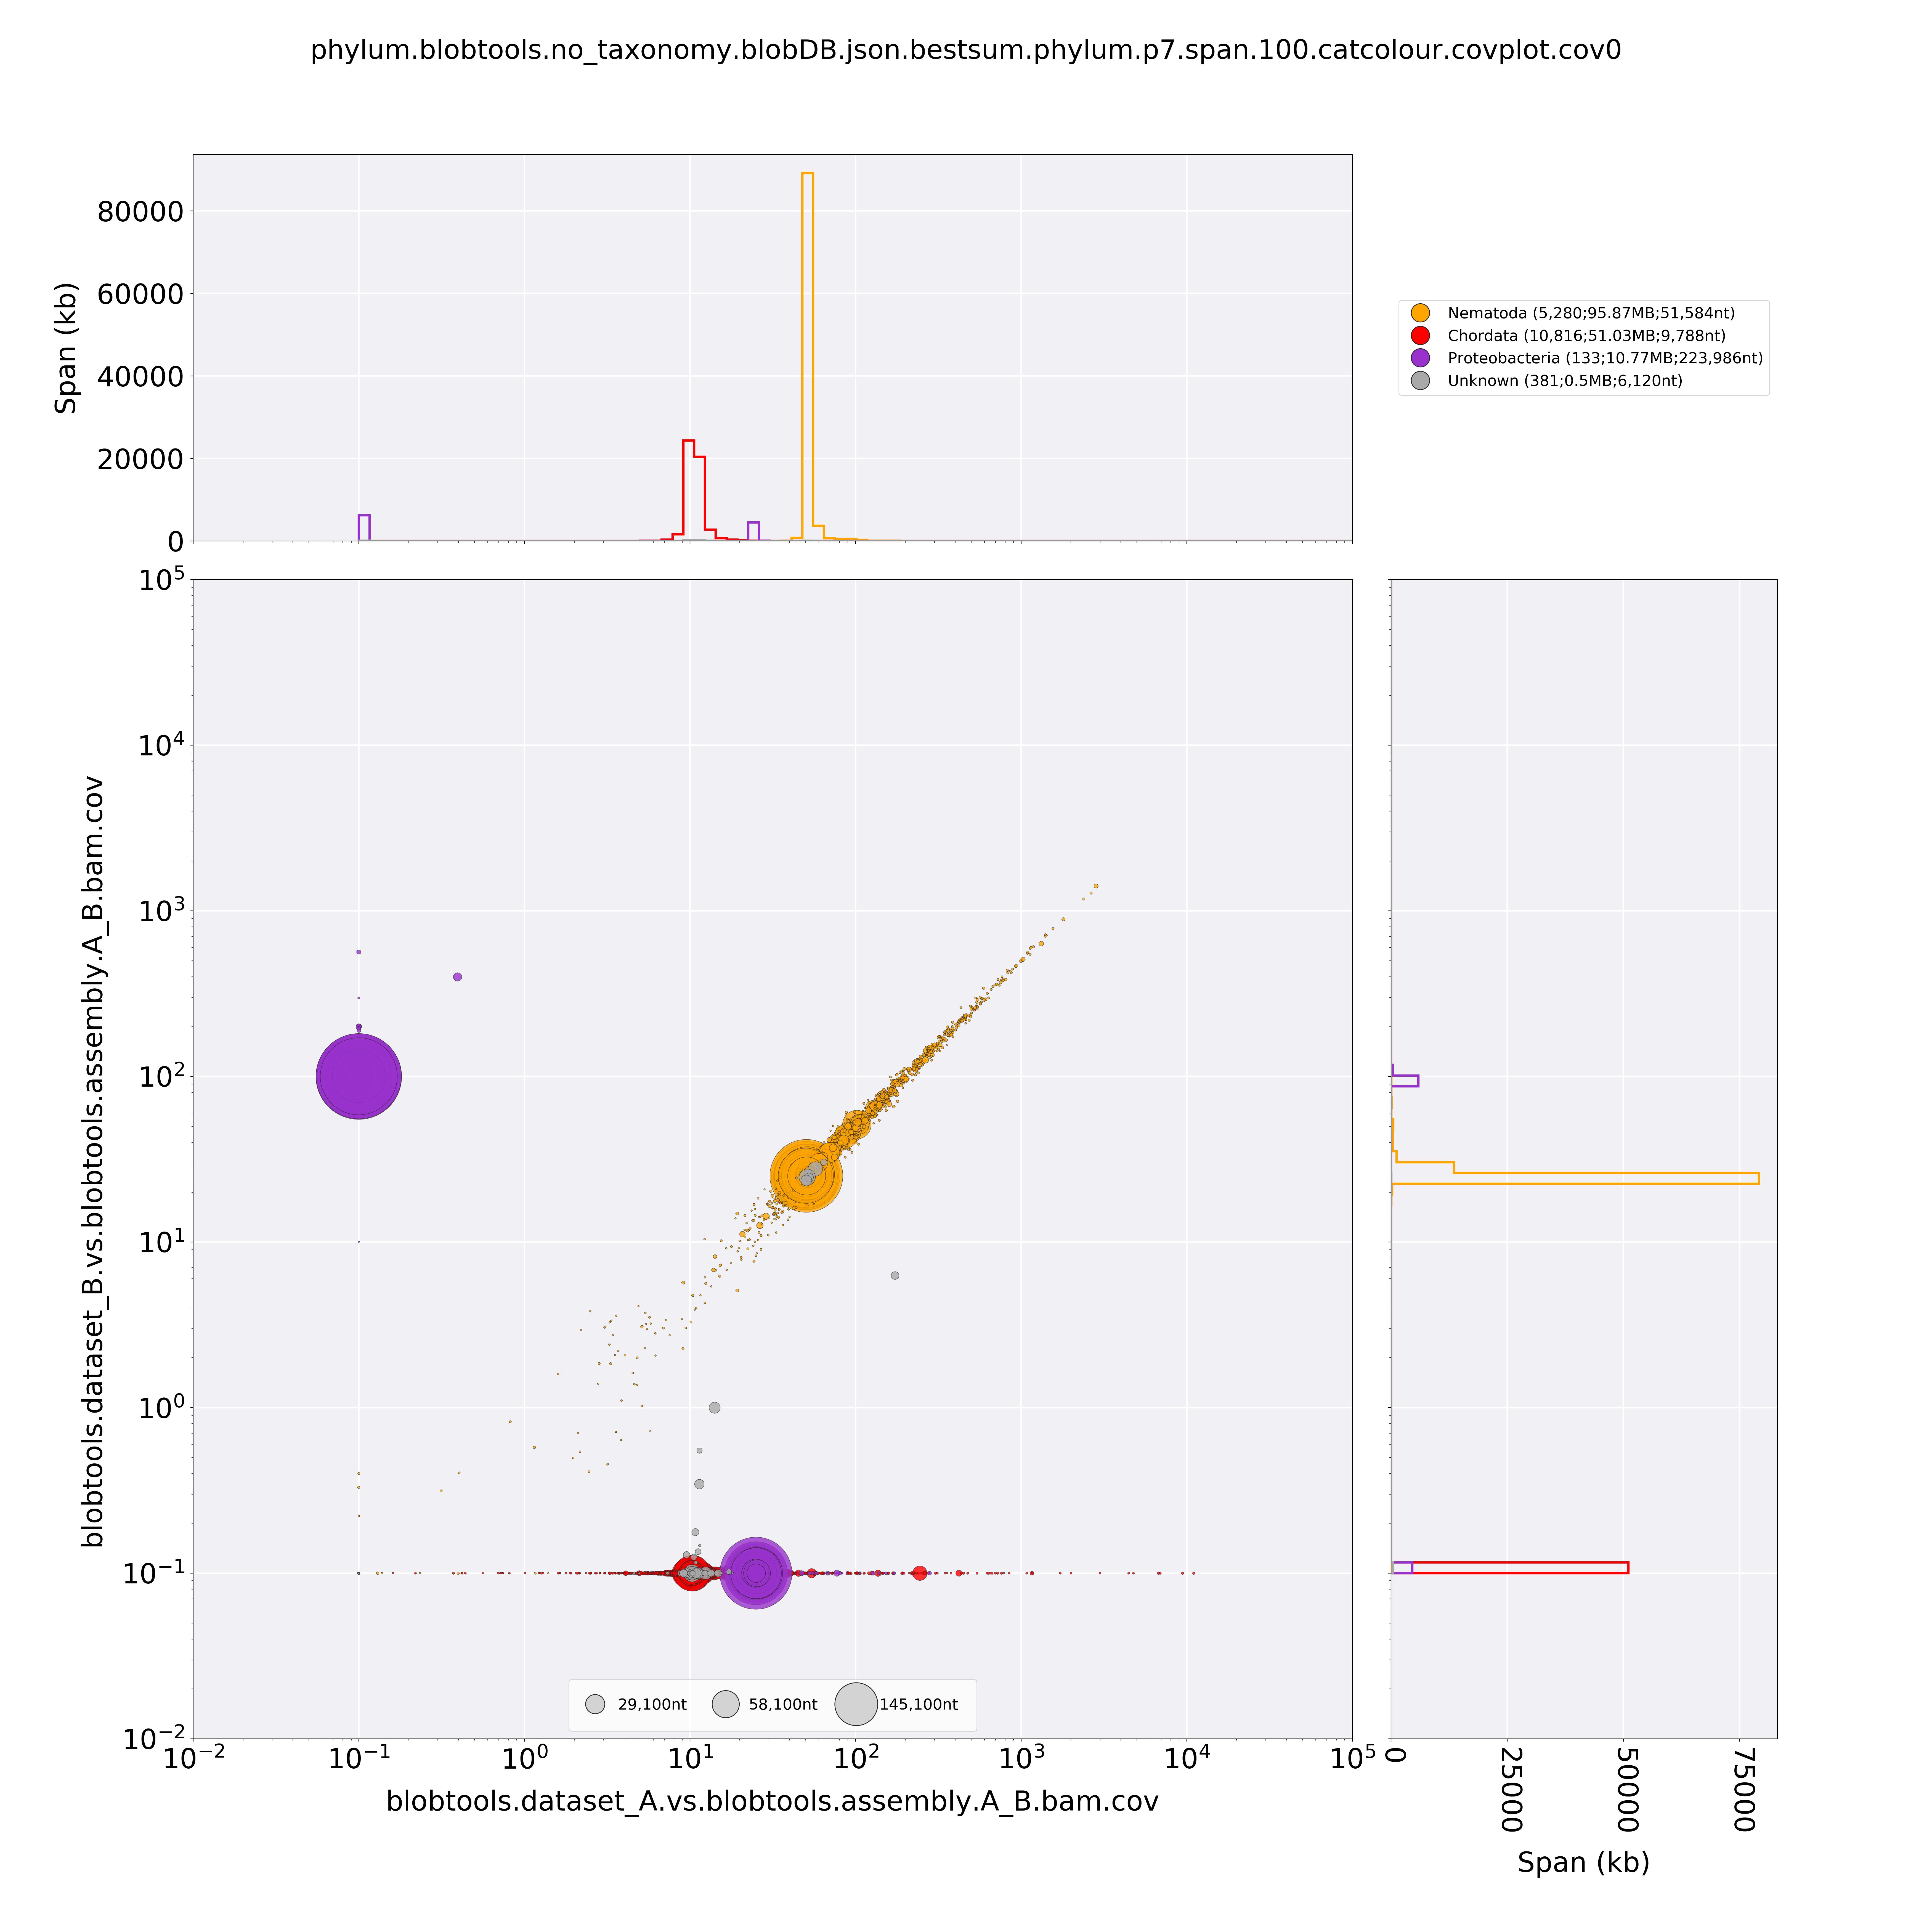 CovPlot of simulated data